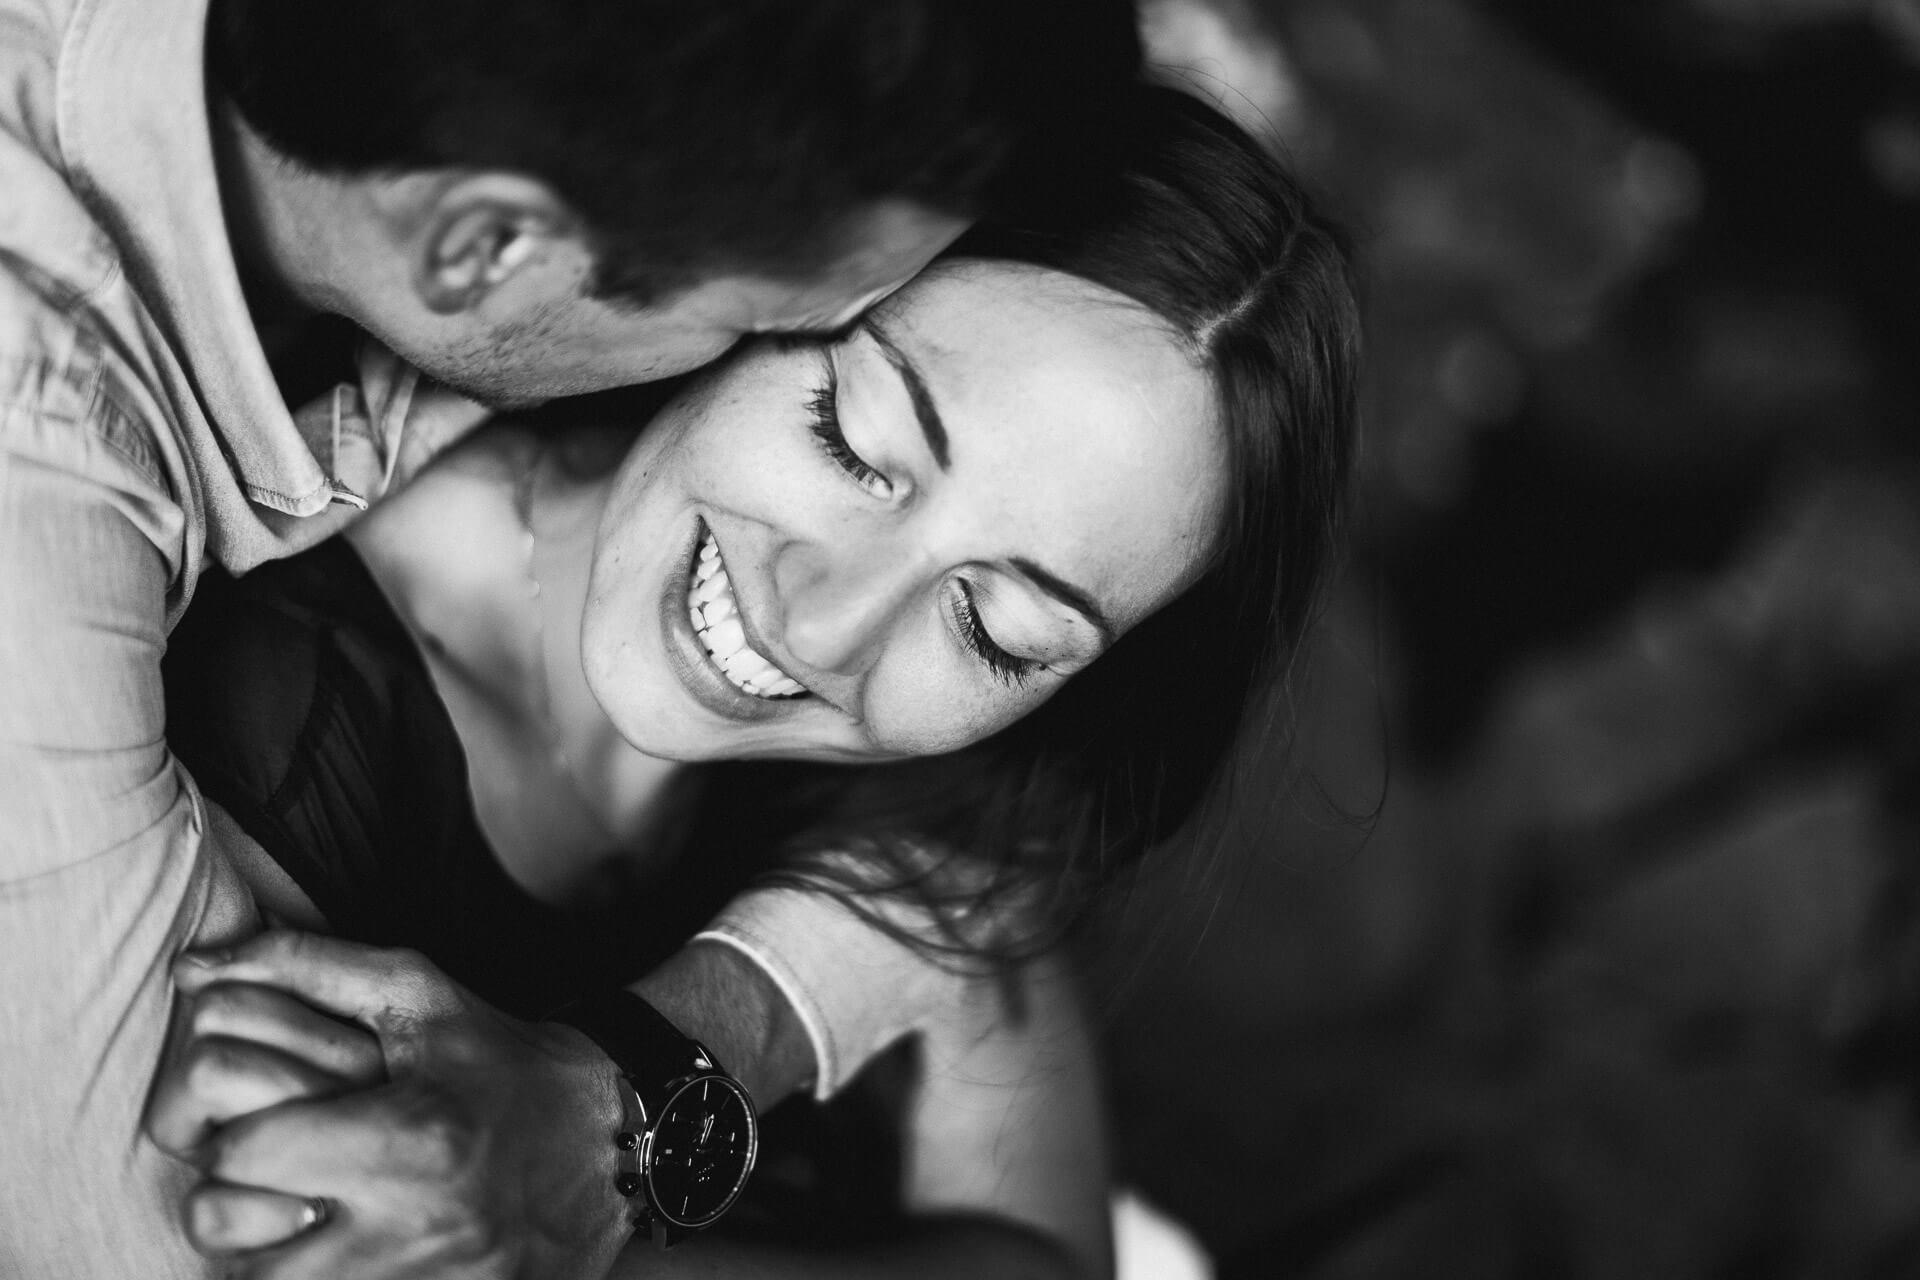 photographe-couple-nature-manon-gaetan-4